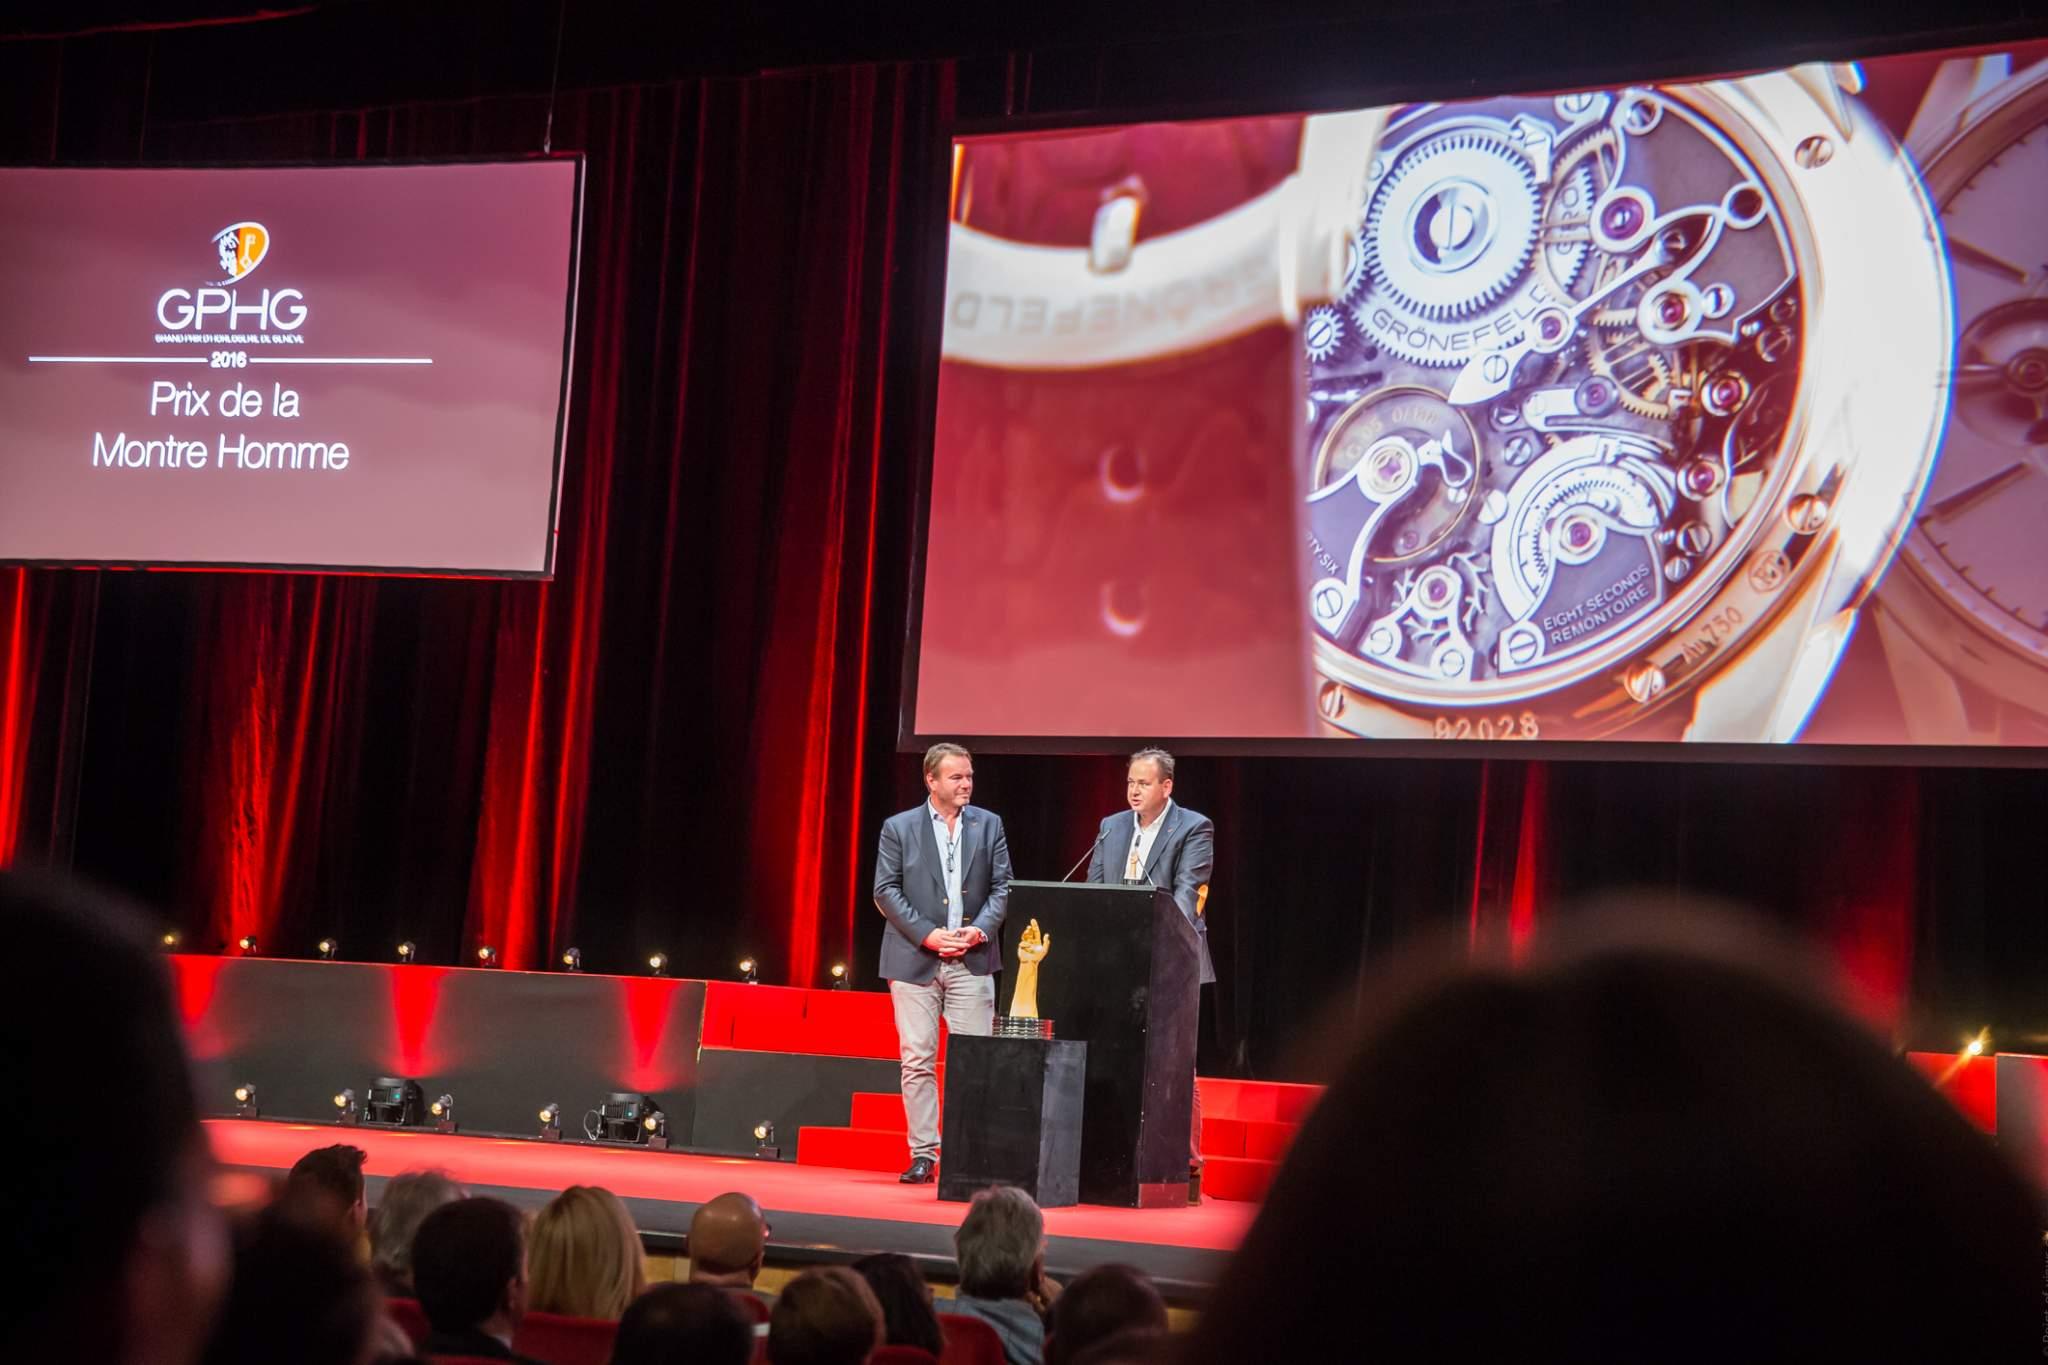 Tim and Bart Grönefeld (Co-founders of Grönefeld, winner of the Men's Wazch Prize 2016)